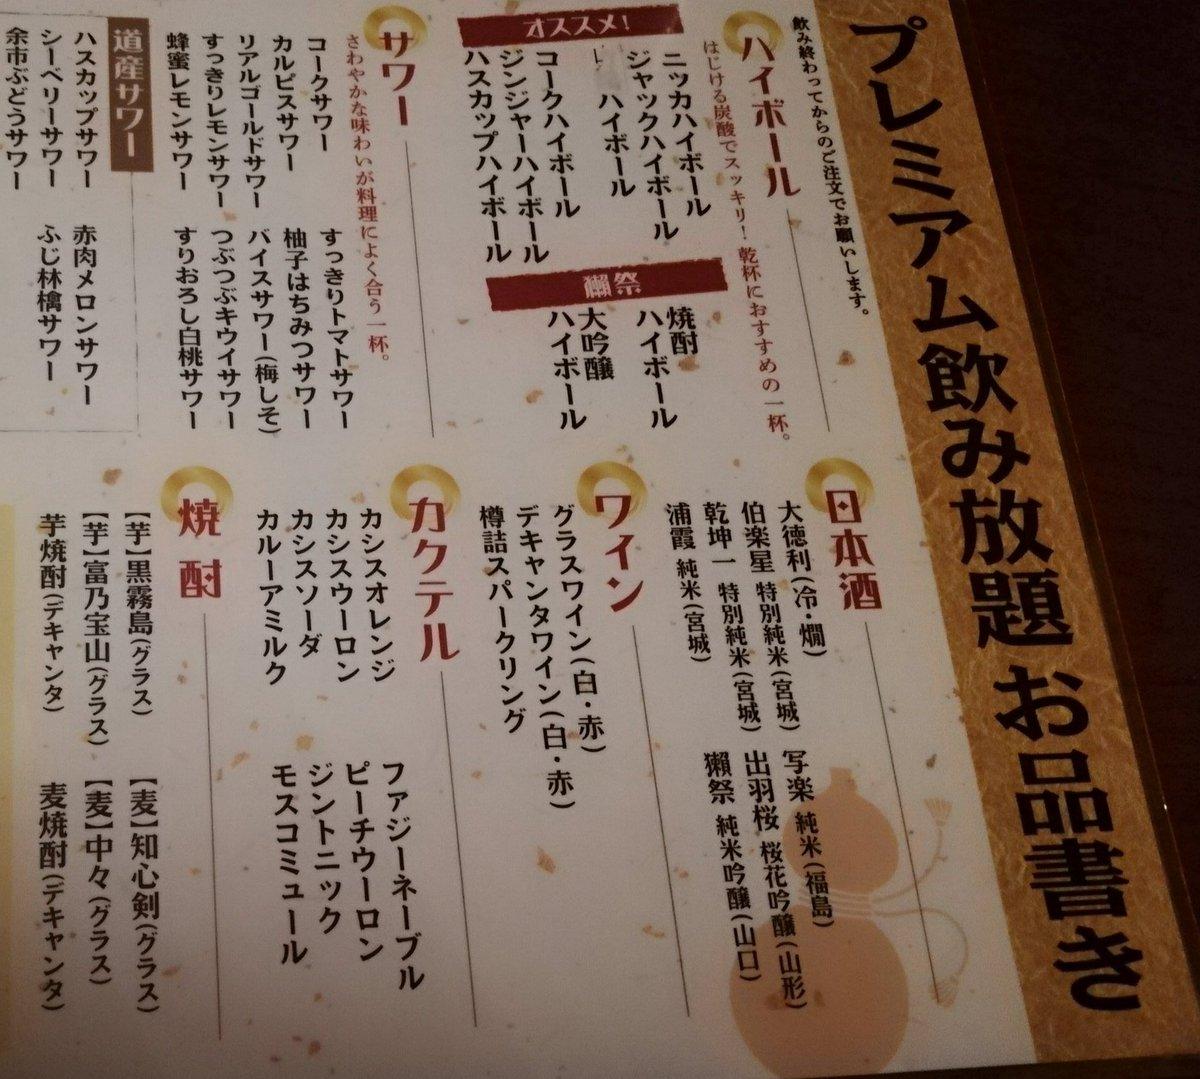 test ツイッターメディア - @mille69ayu 日本酒は伯楽星 浦霞、写楽、獺祭 飲みました〜😊✨ https://t.co/NGsYpiZJoR